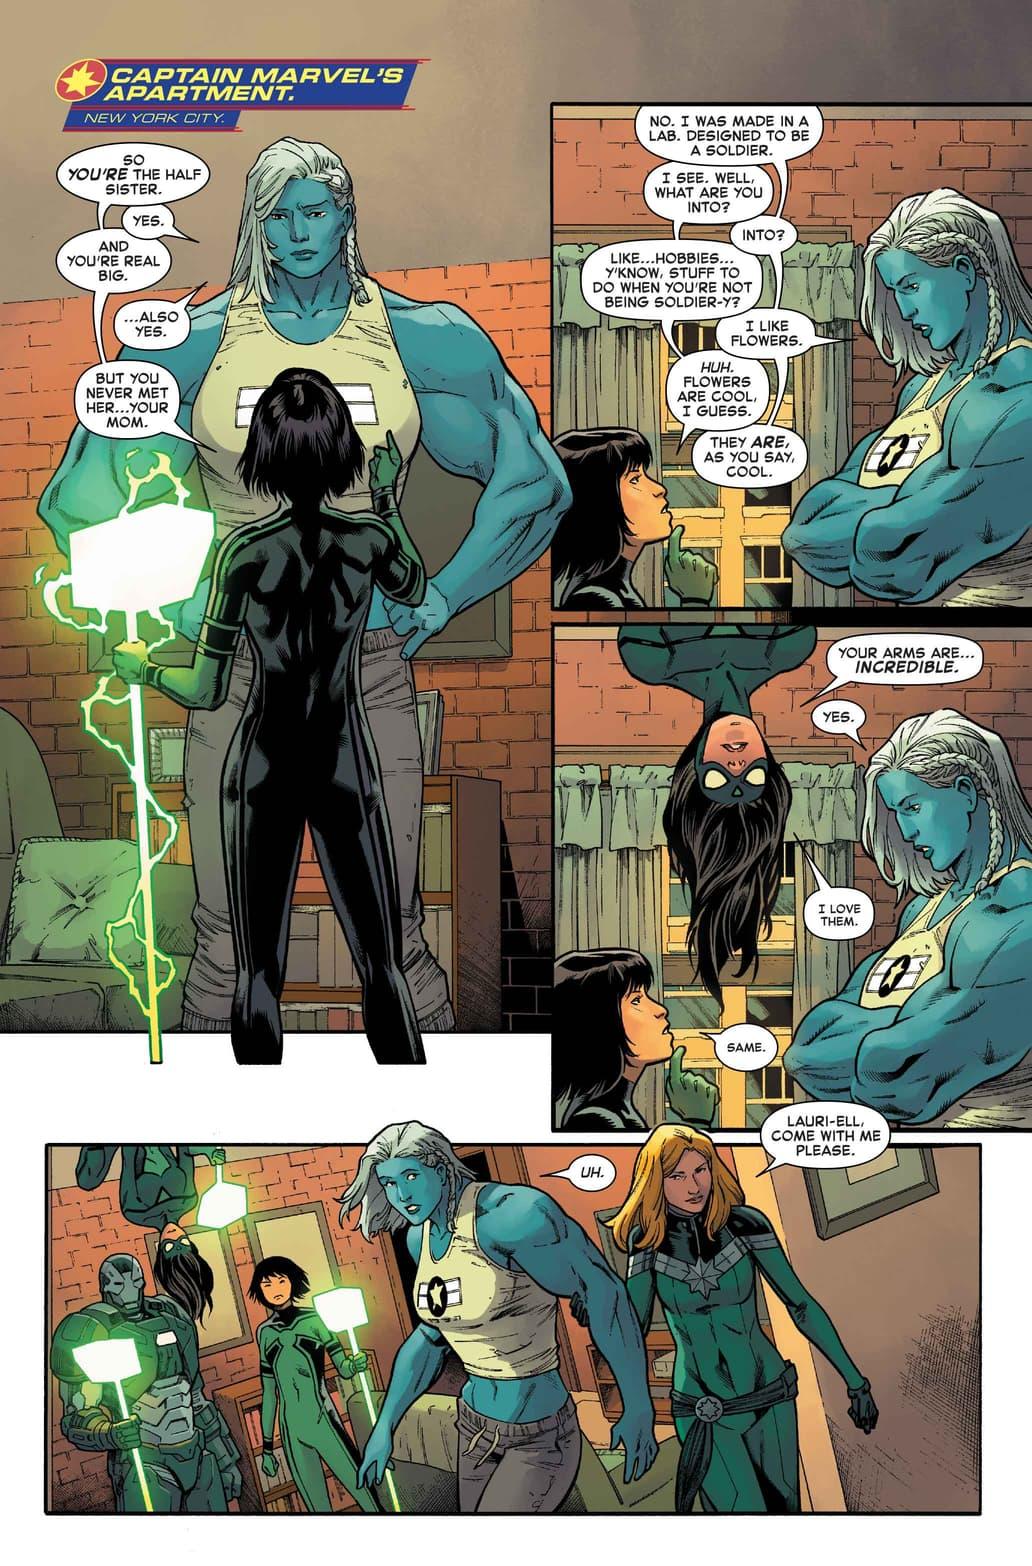 Captain Marvel #20 preview